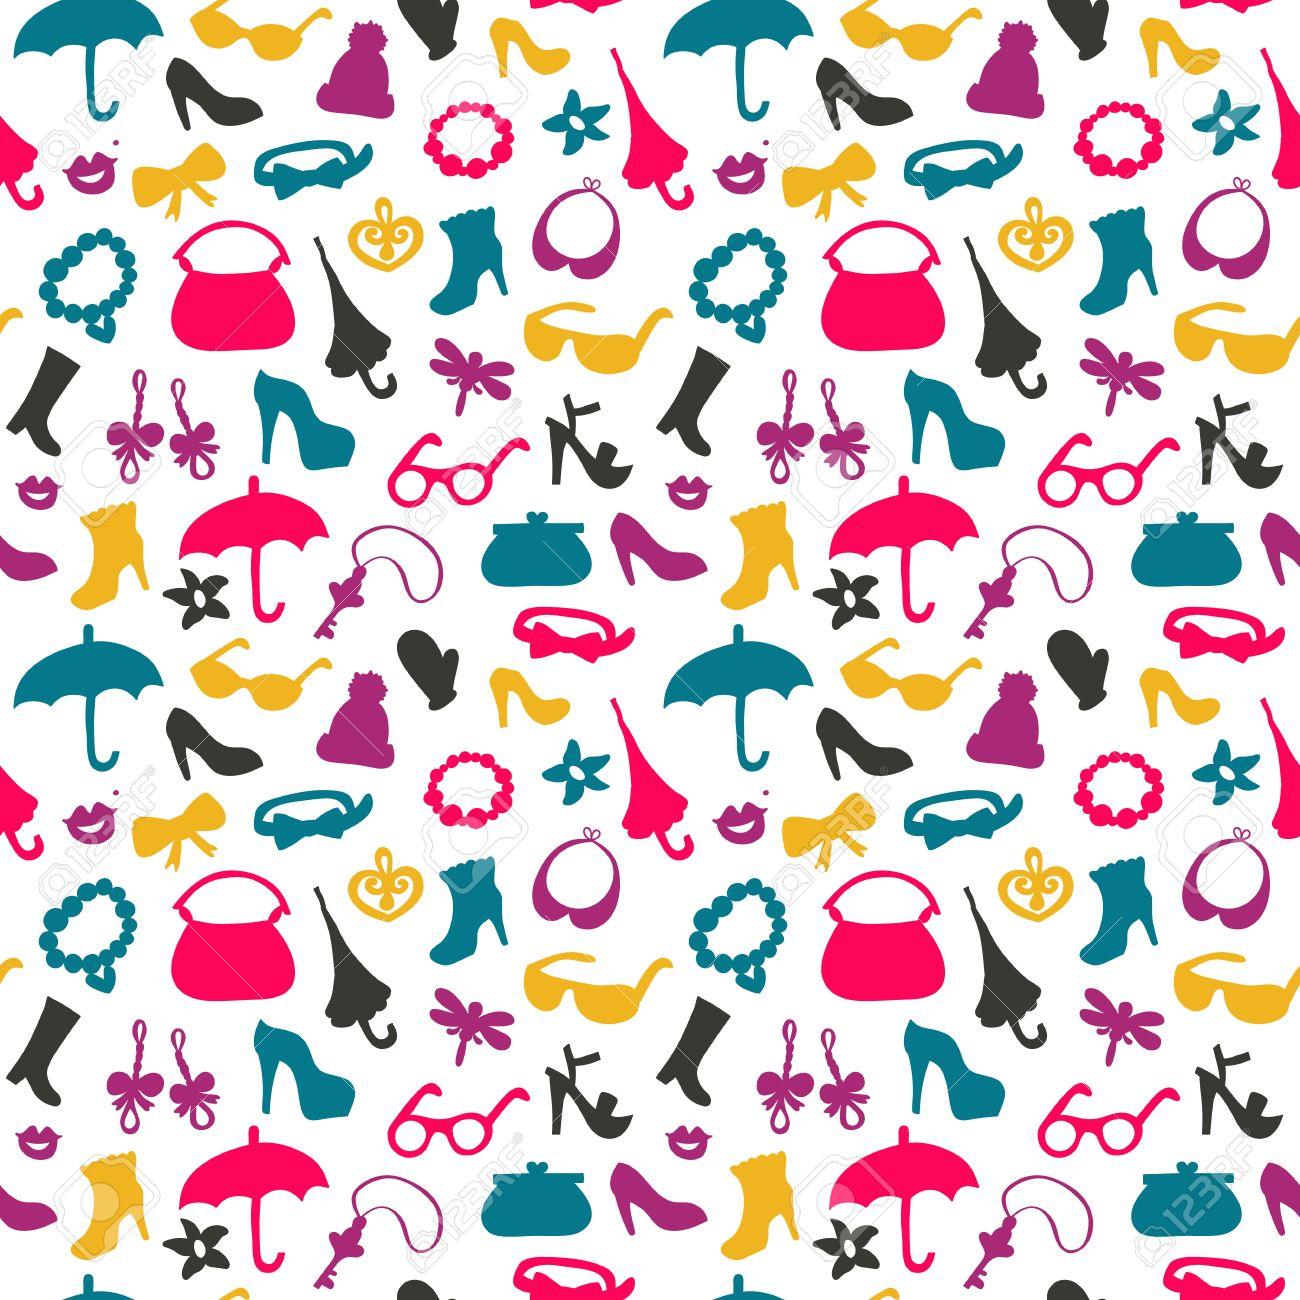 Background Of Women Accessories Textures For Wallpaper Fills